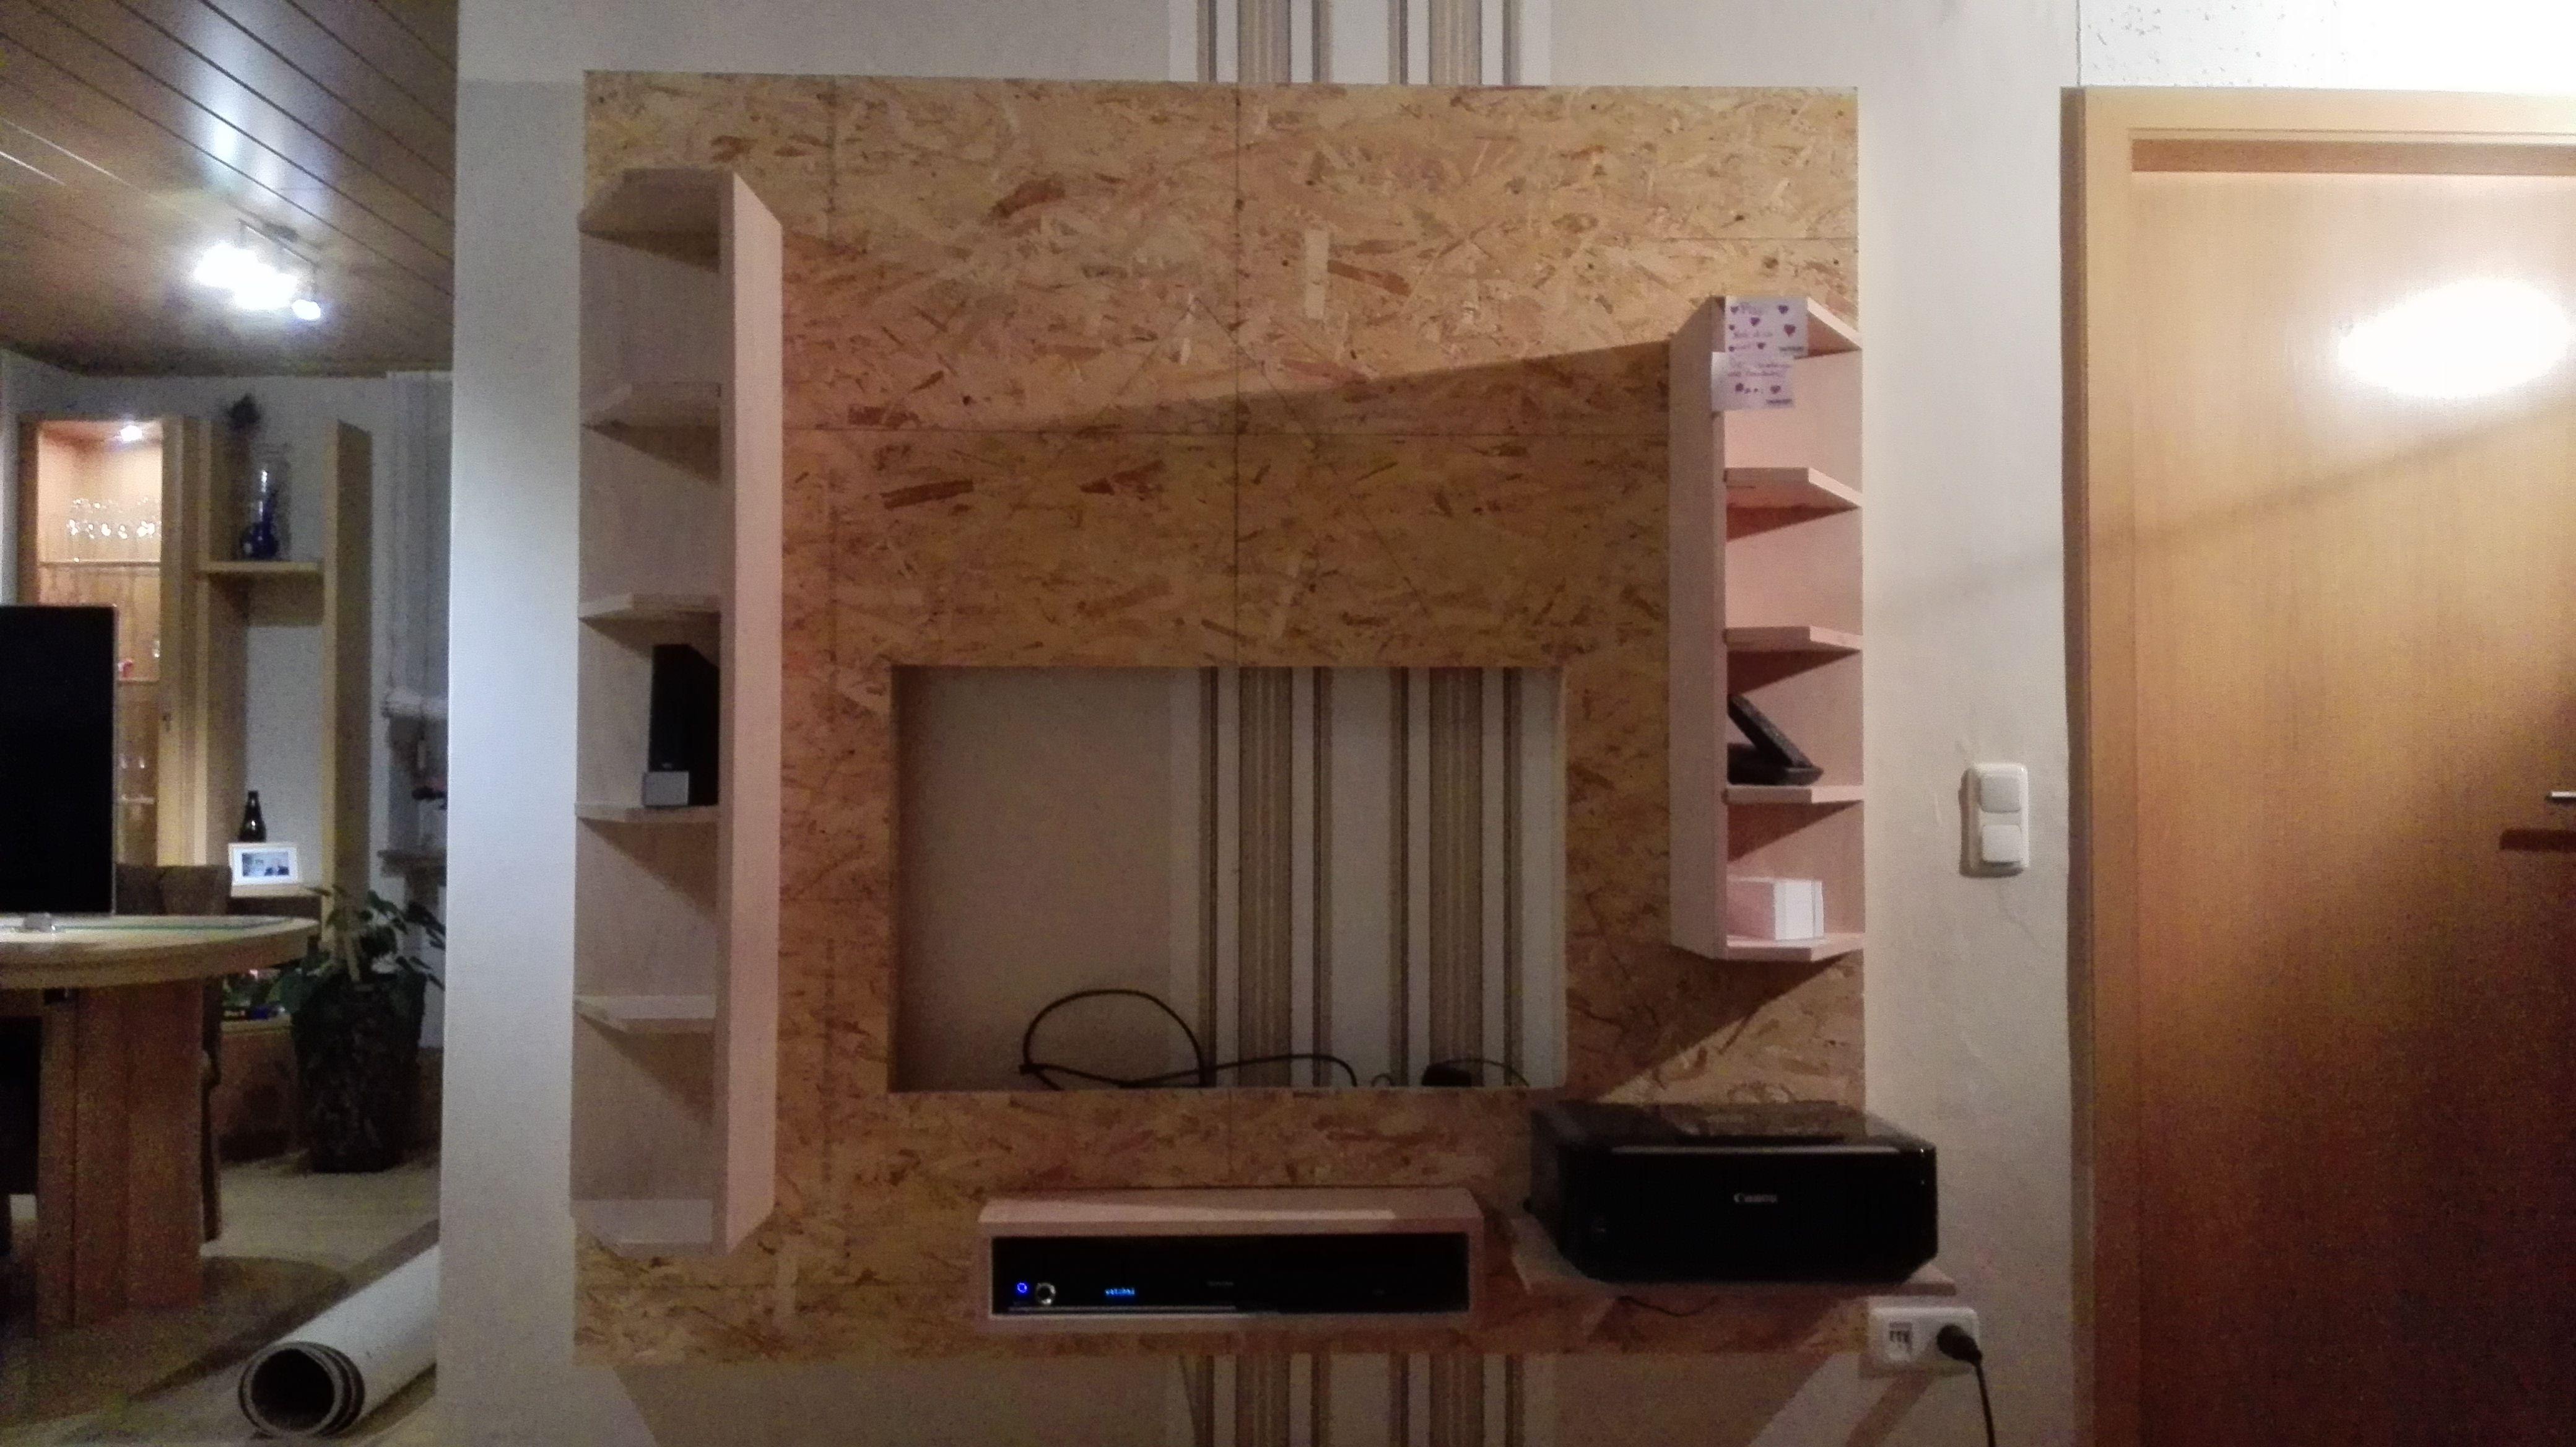 Tv wand günstig selber bauen  TV Wand Bauanleitung zum selber bauen | Heimwerker-Forum ...